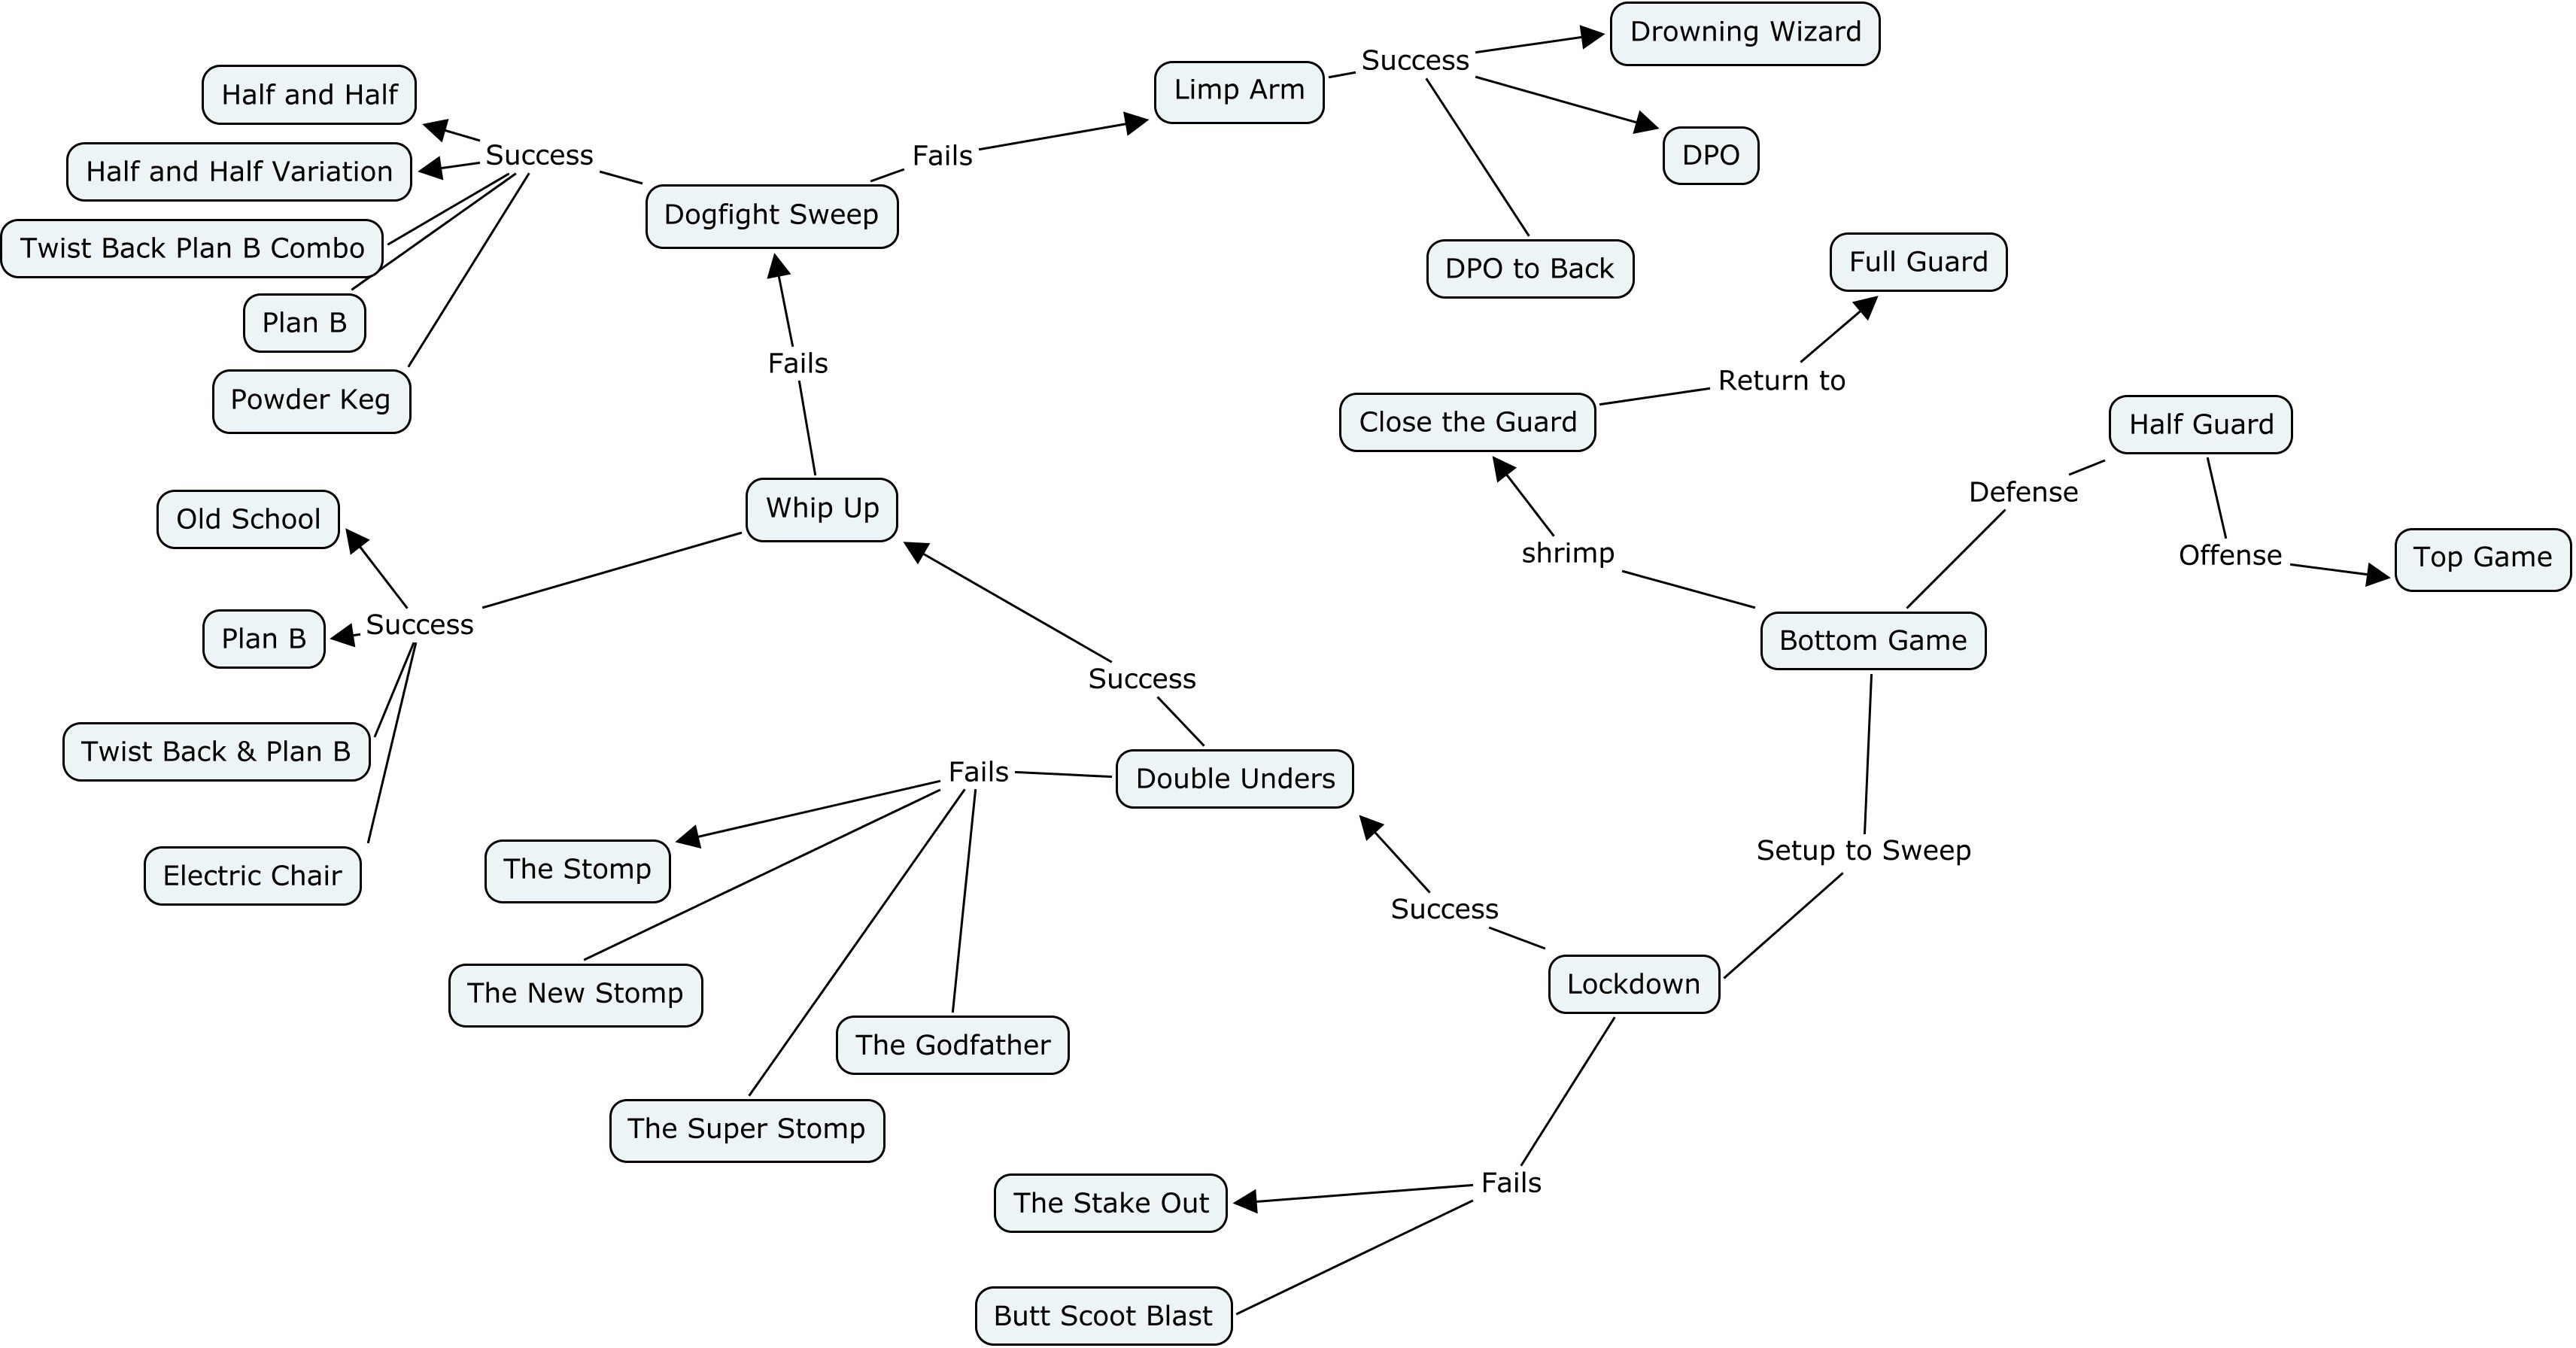 jiu jitsu diagrams image result for bjj flow diagram | martial arts | bjj techniques, brazilian jiu jitsu, judo